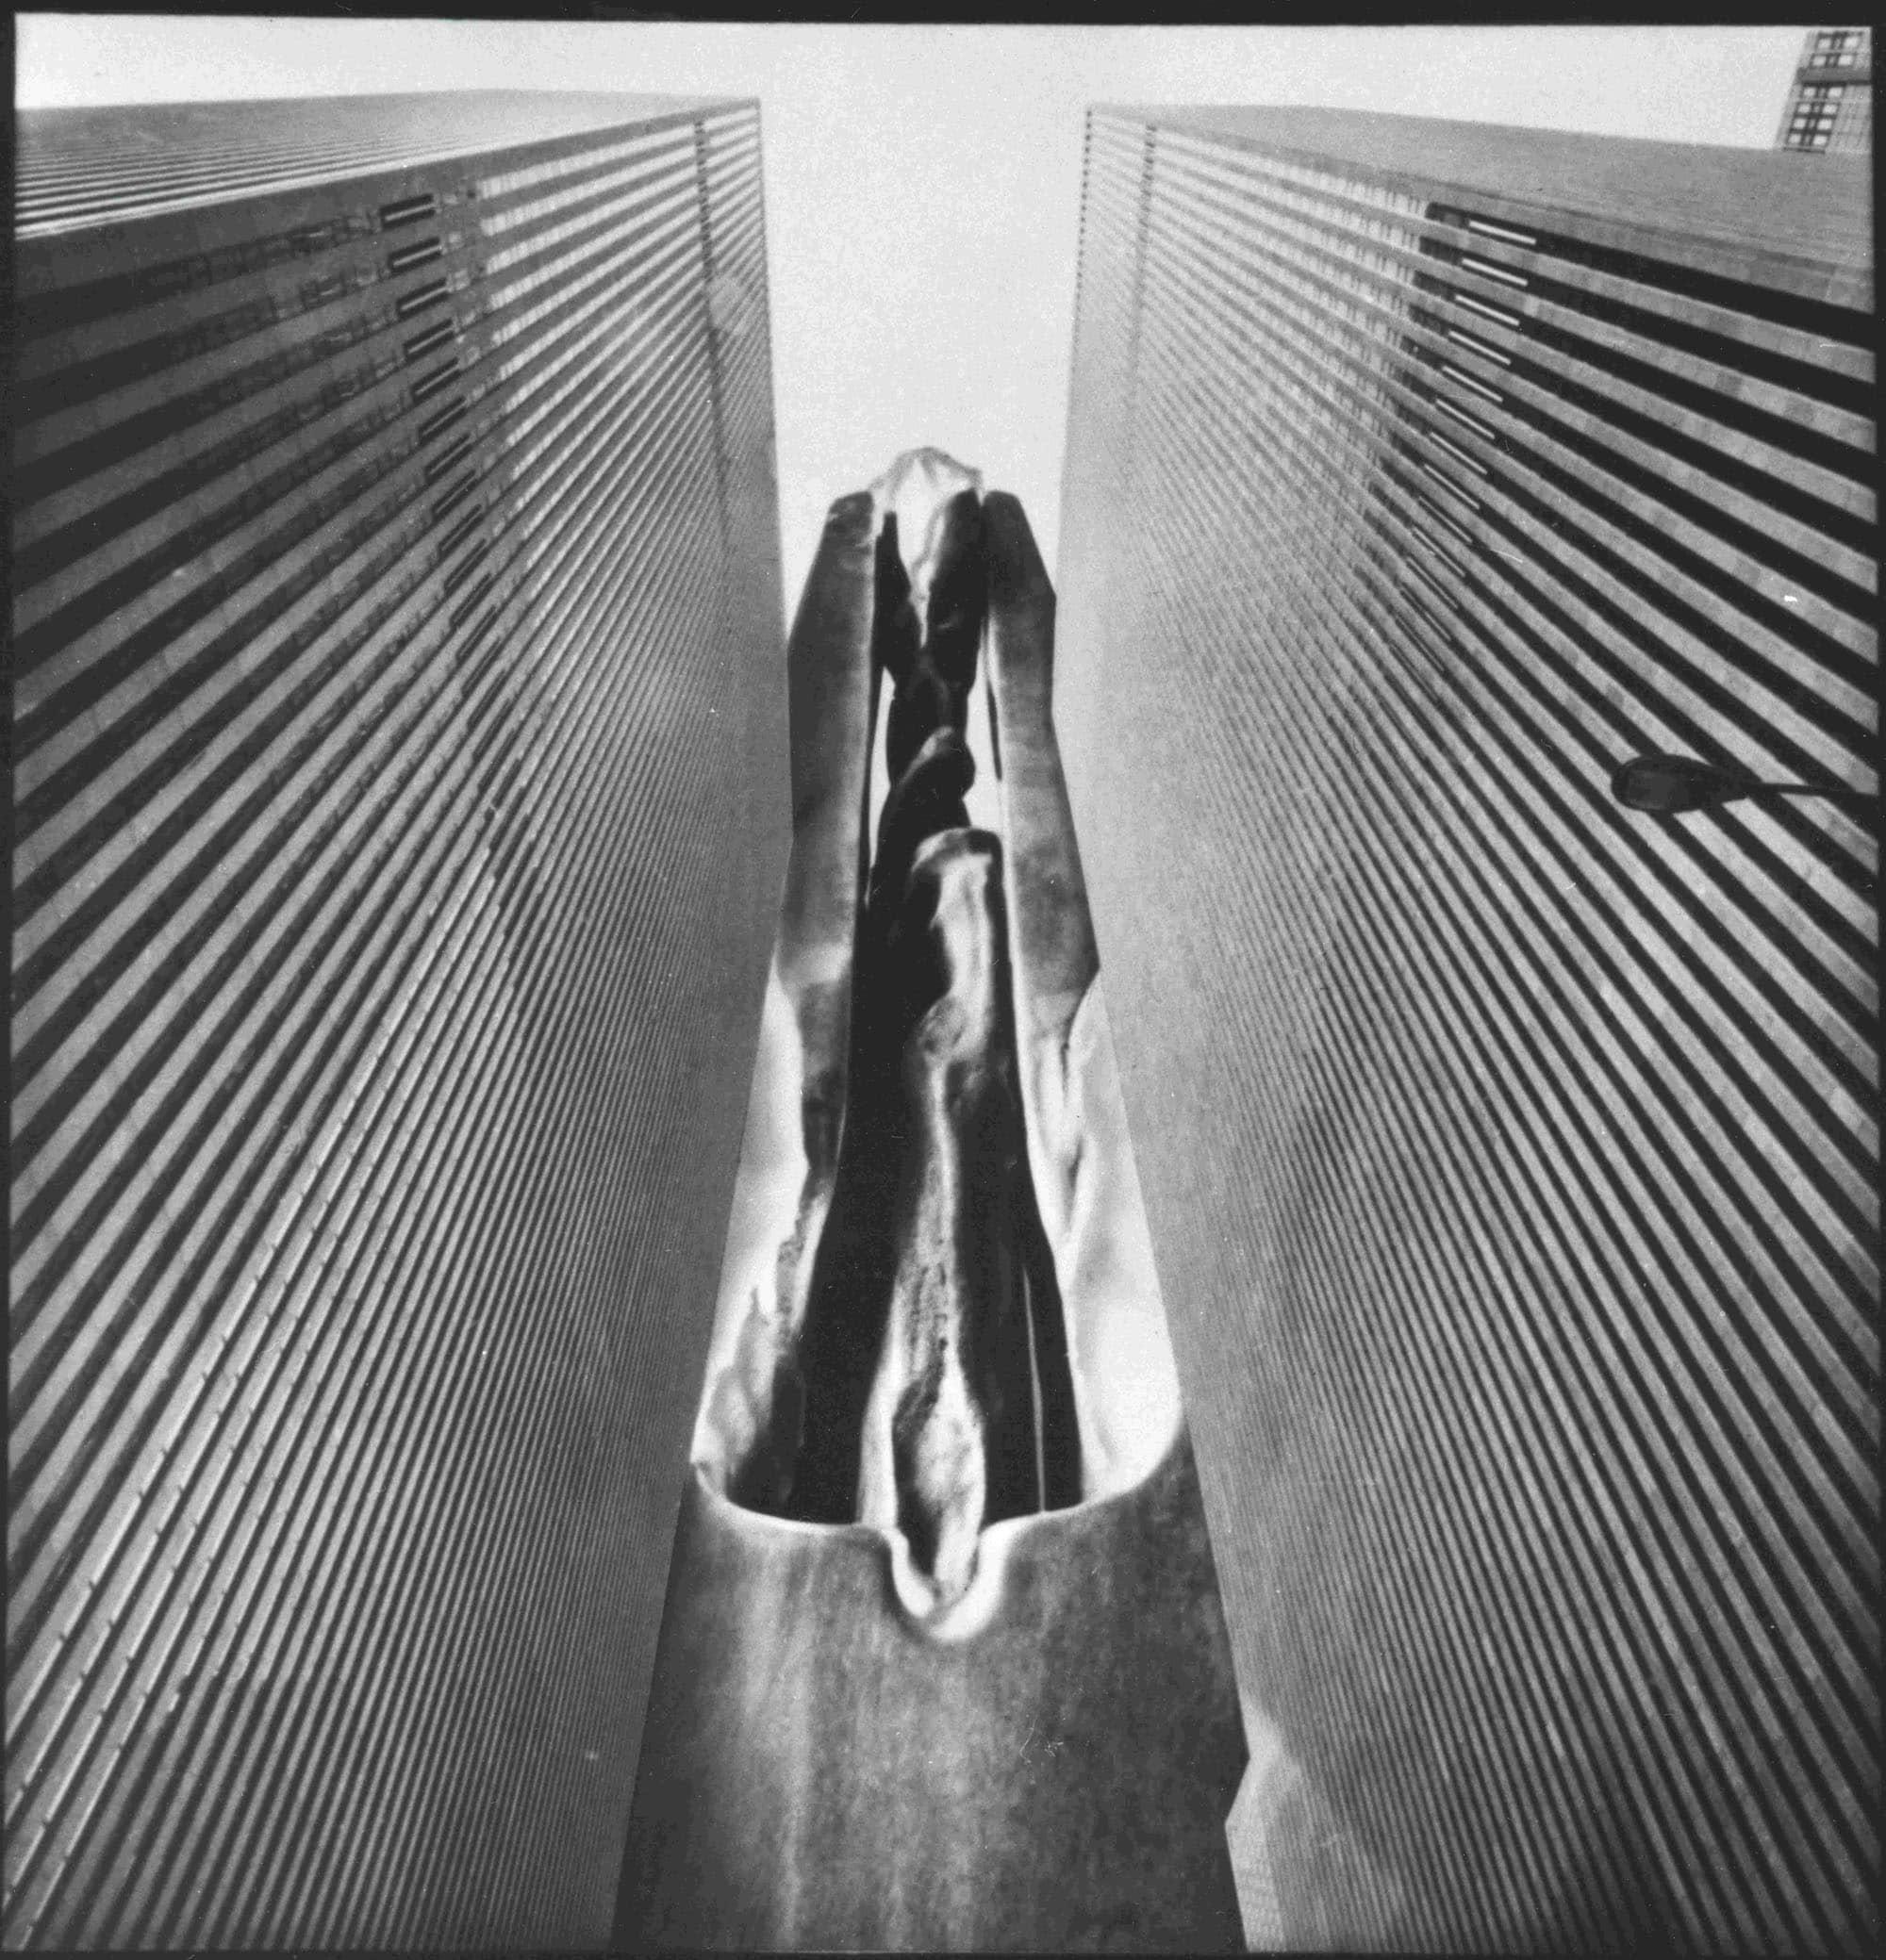 Francesco Somaini: a sculptor for the city. New York 1967-1976